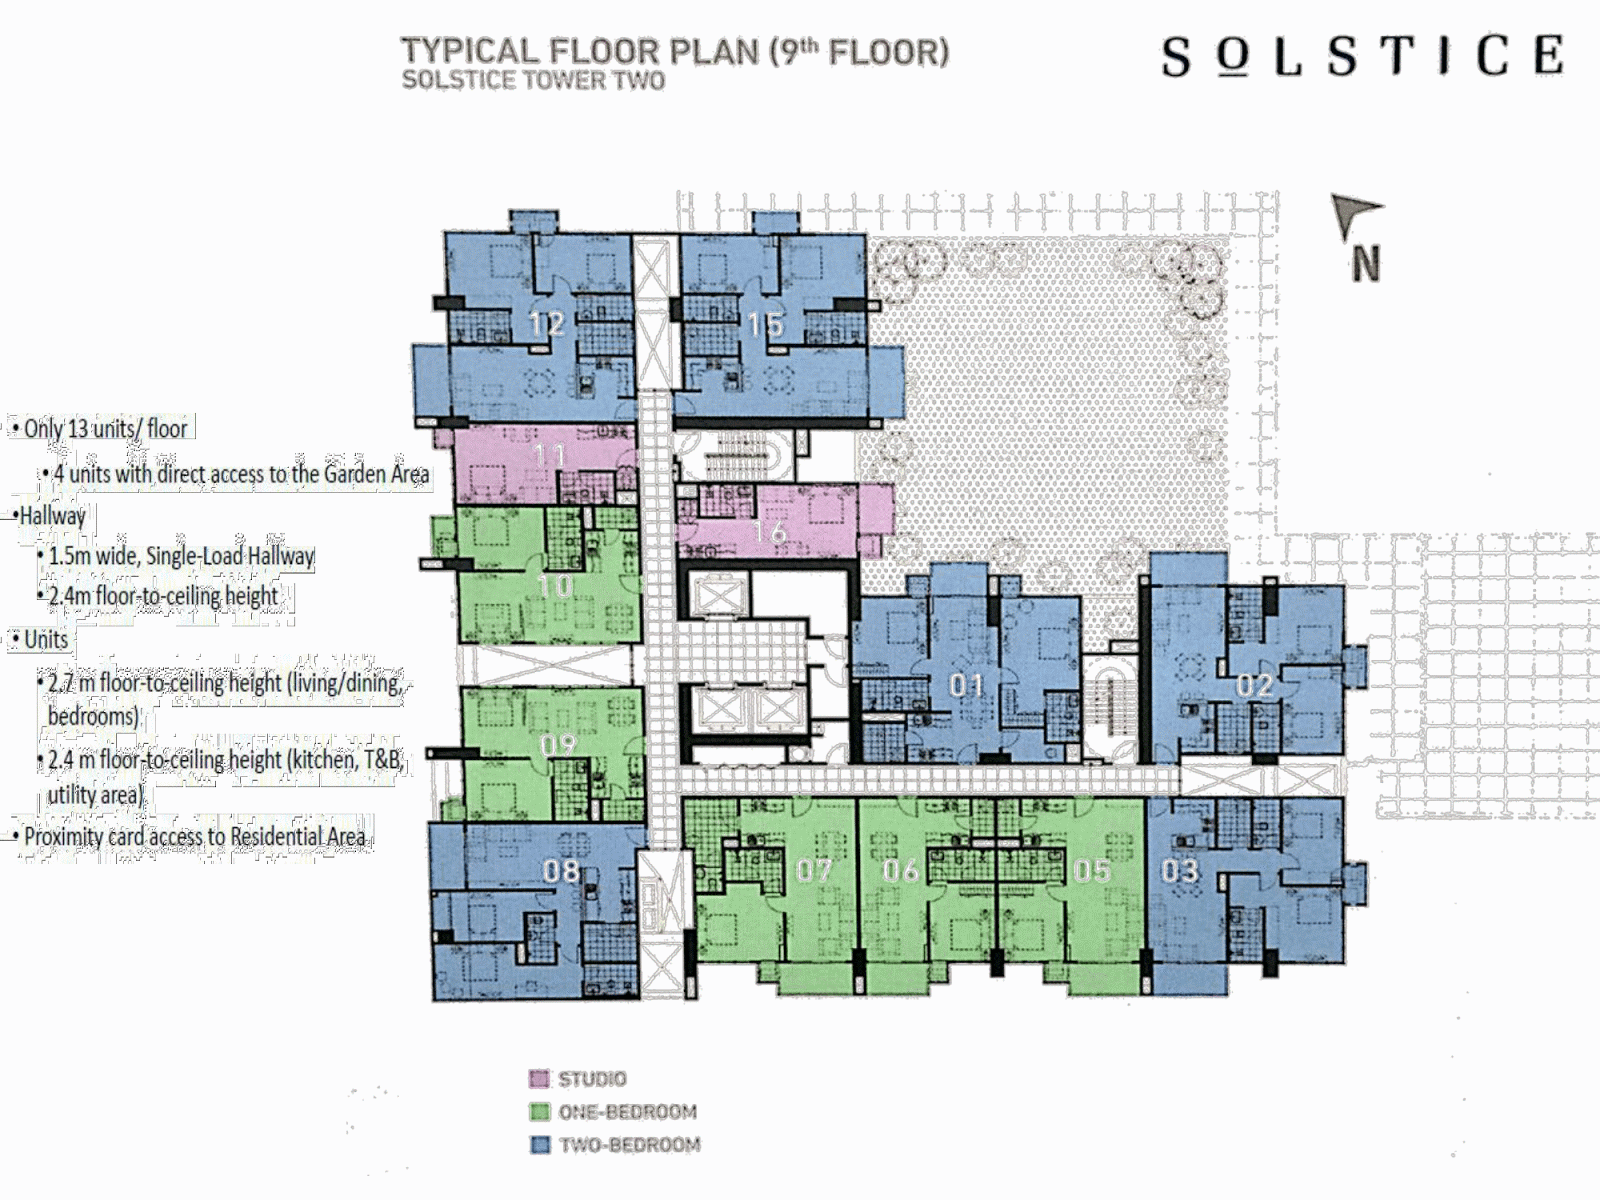 Solstice Circuit Makati – AyalaLand Seller